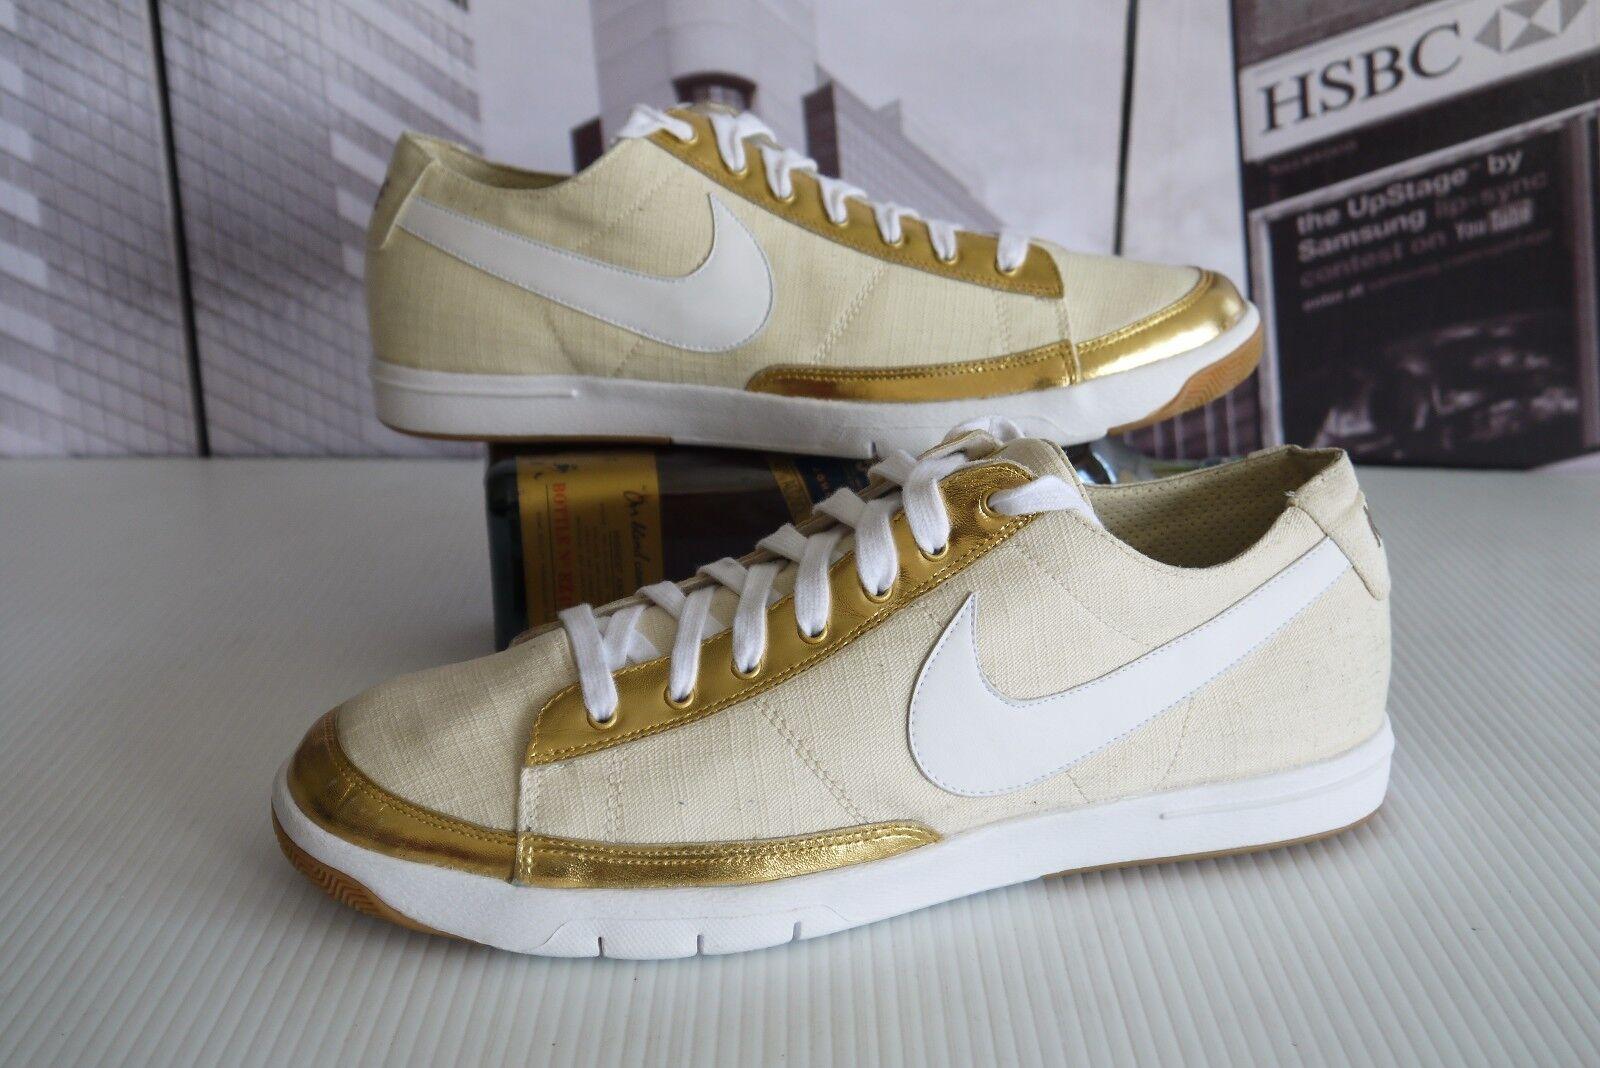 2007 Nike Women's Blazer LP 314386 111 Cream Metallic Gold women's US 11